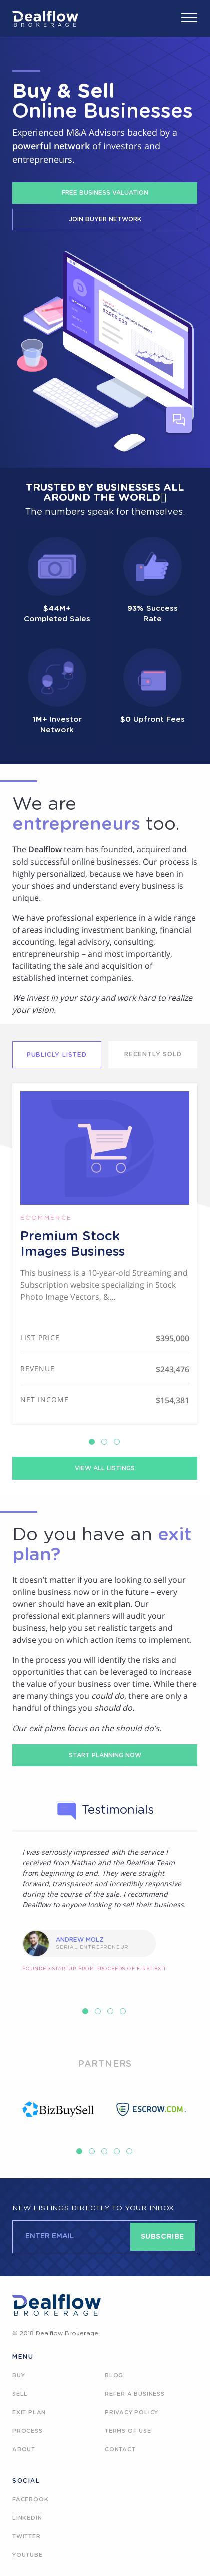 Example of Design for Finance, Investing, Mobile Landing Page by dealflowbrokerage.com | Mobile Landing Page Design